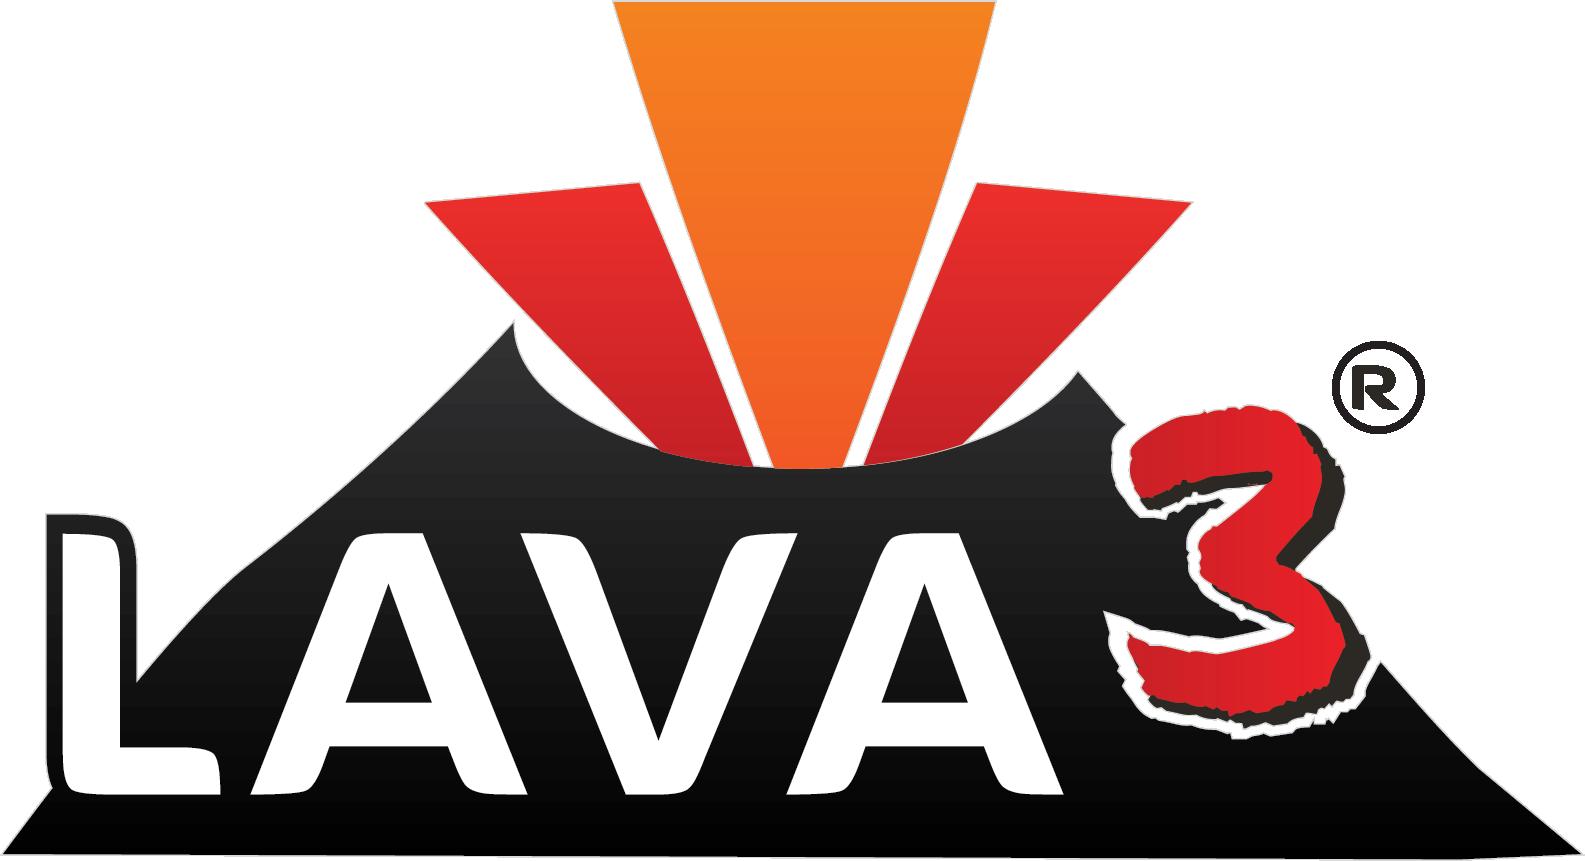 lava3-logo